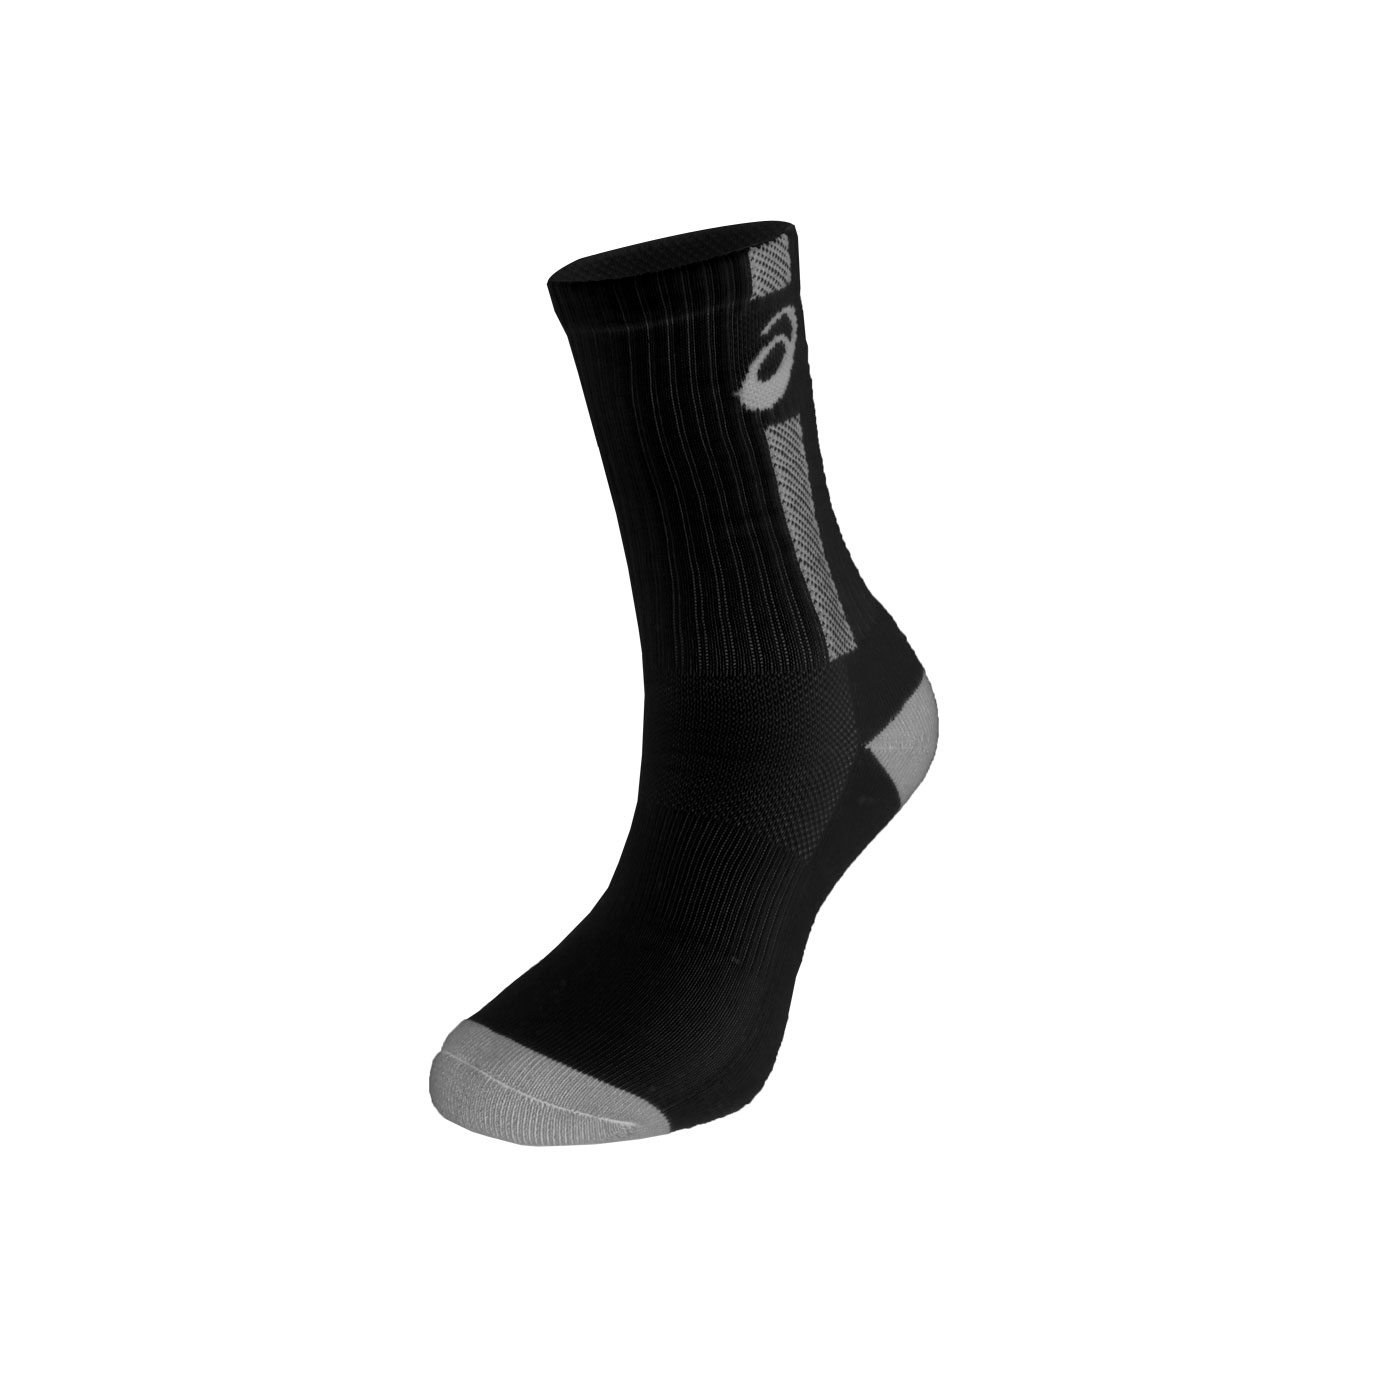 ASICS 排球襪 Z12009-90 - 黑灰